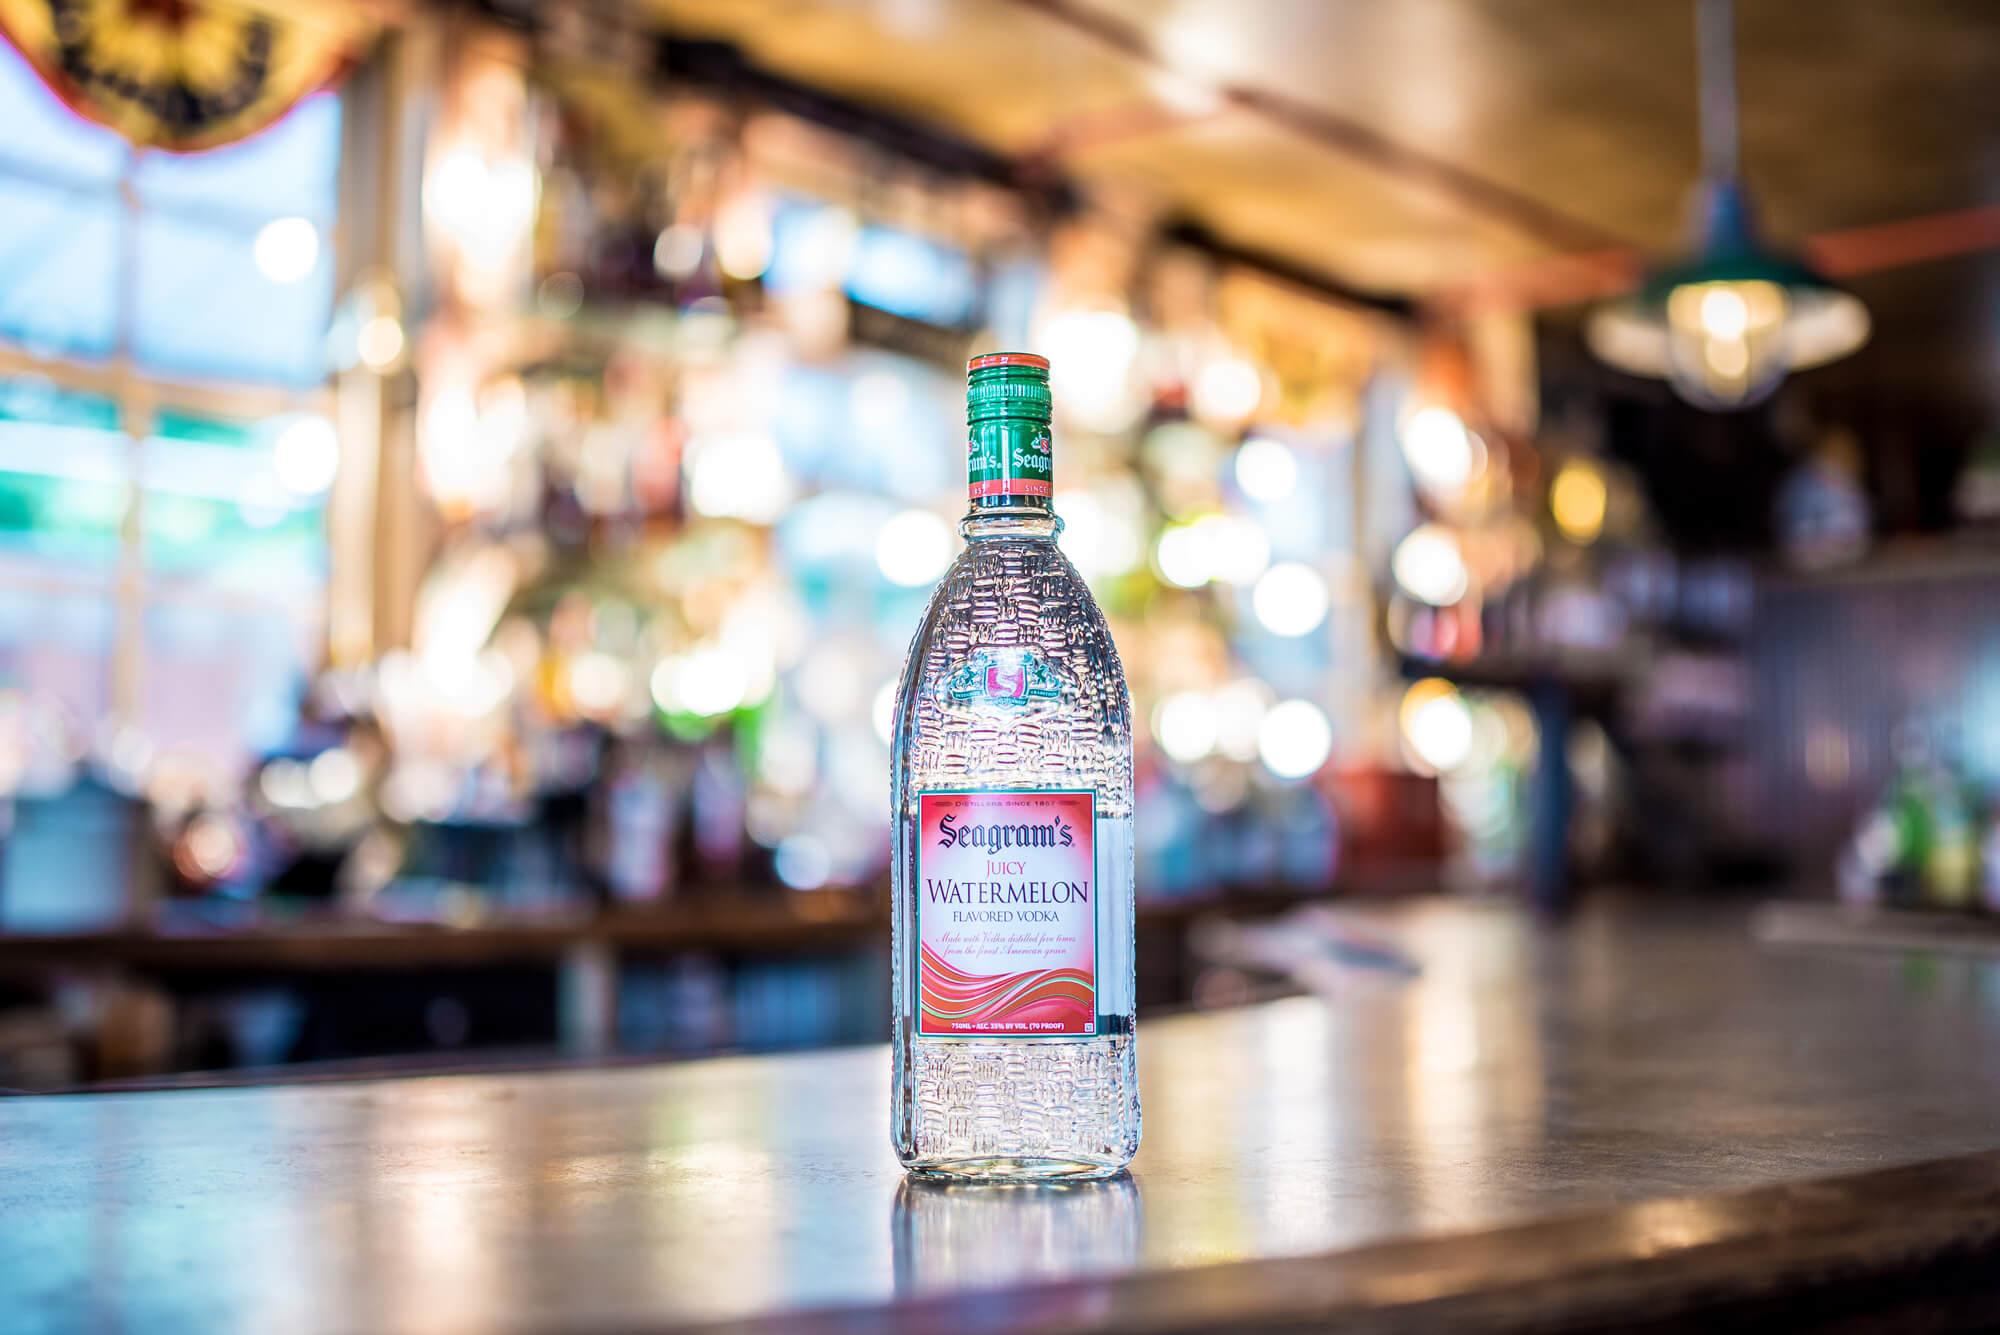 Seagram's Vodka announces Juicy Watermelon Vodka - What's Shakin' week of June 5